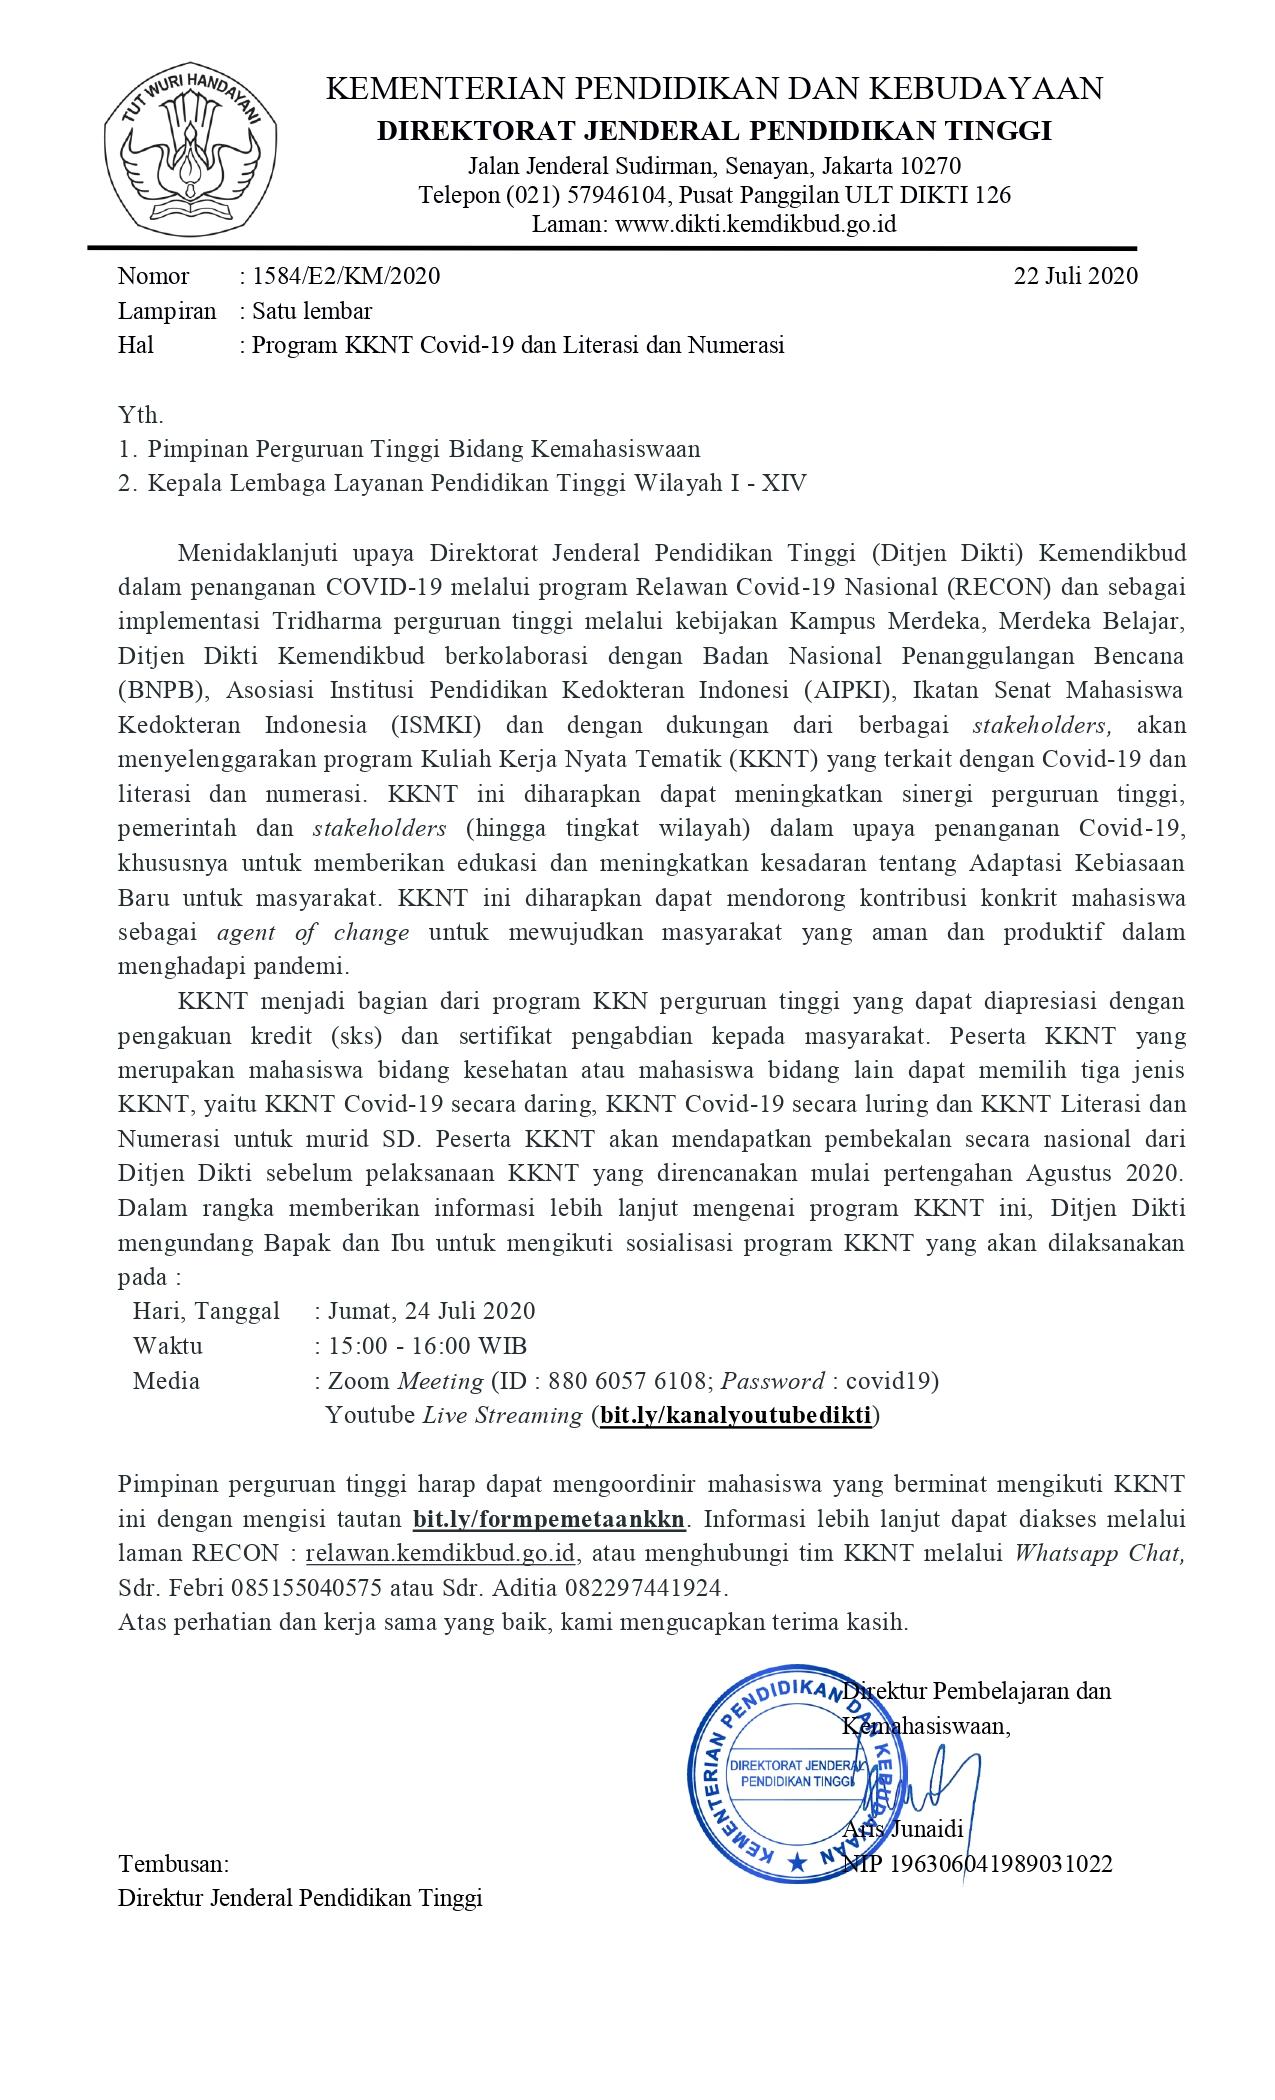 Program KKNT Covid-19 Literasi dan Numerasi